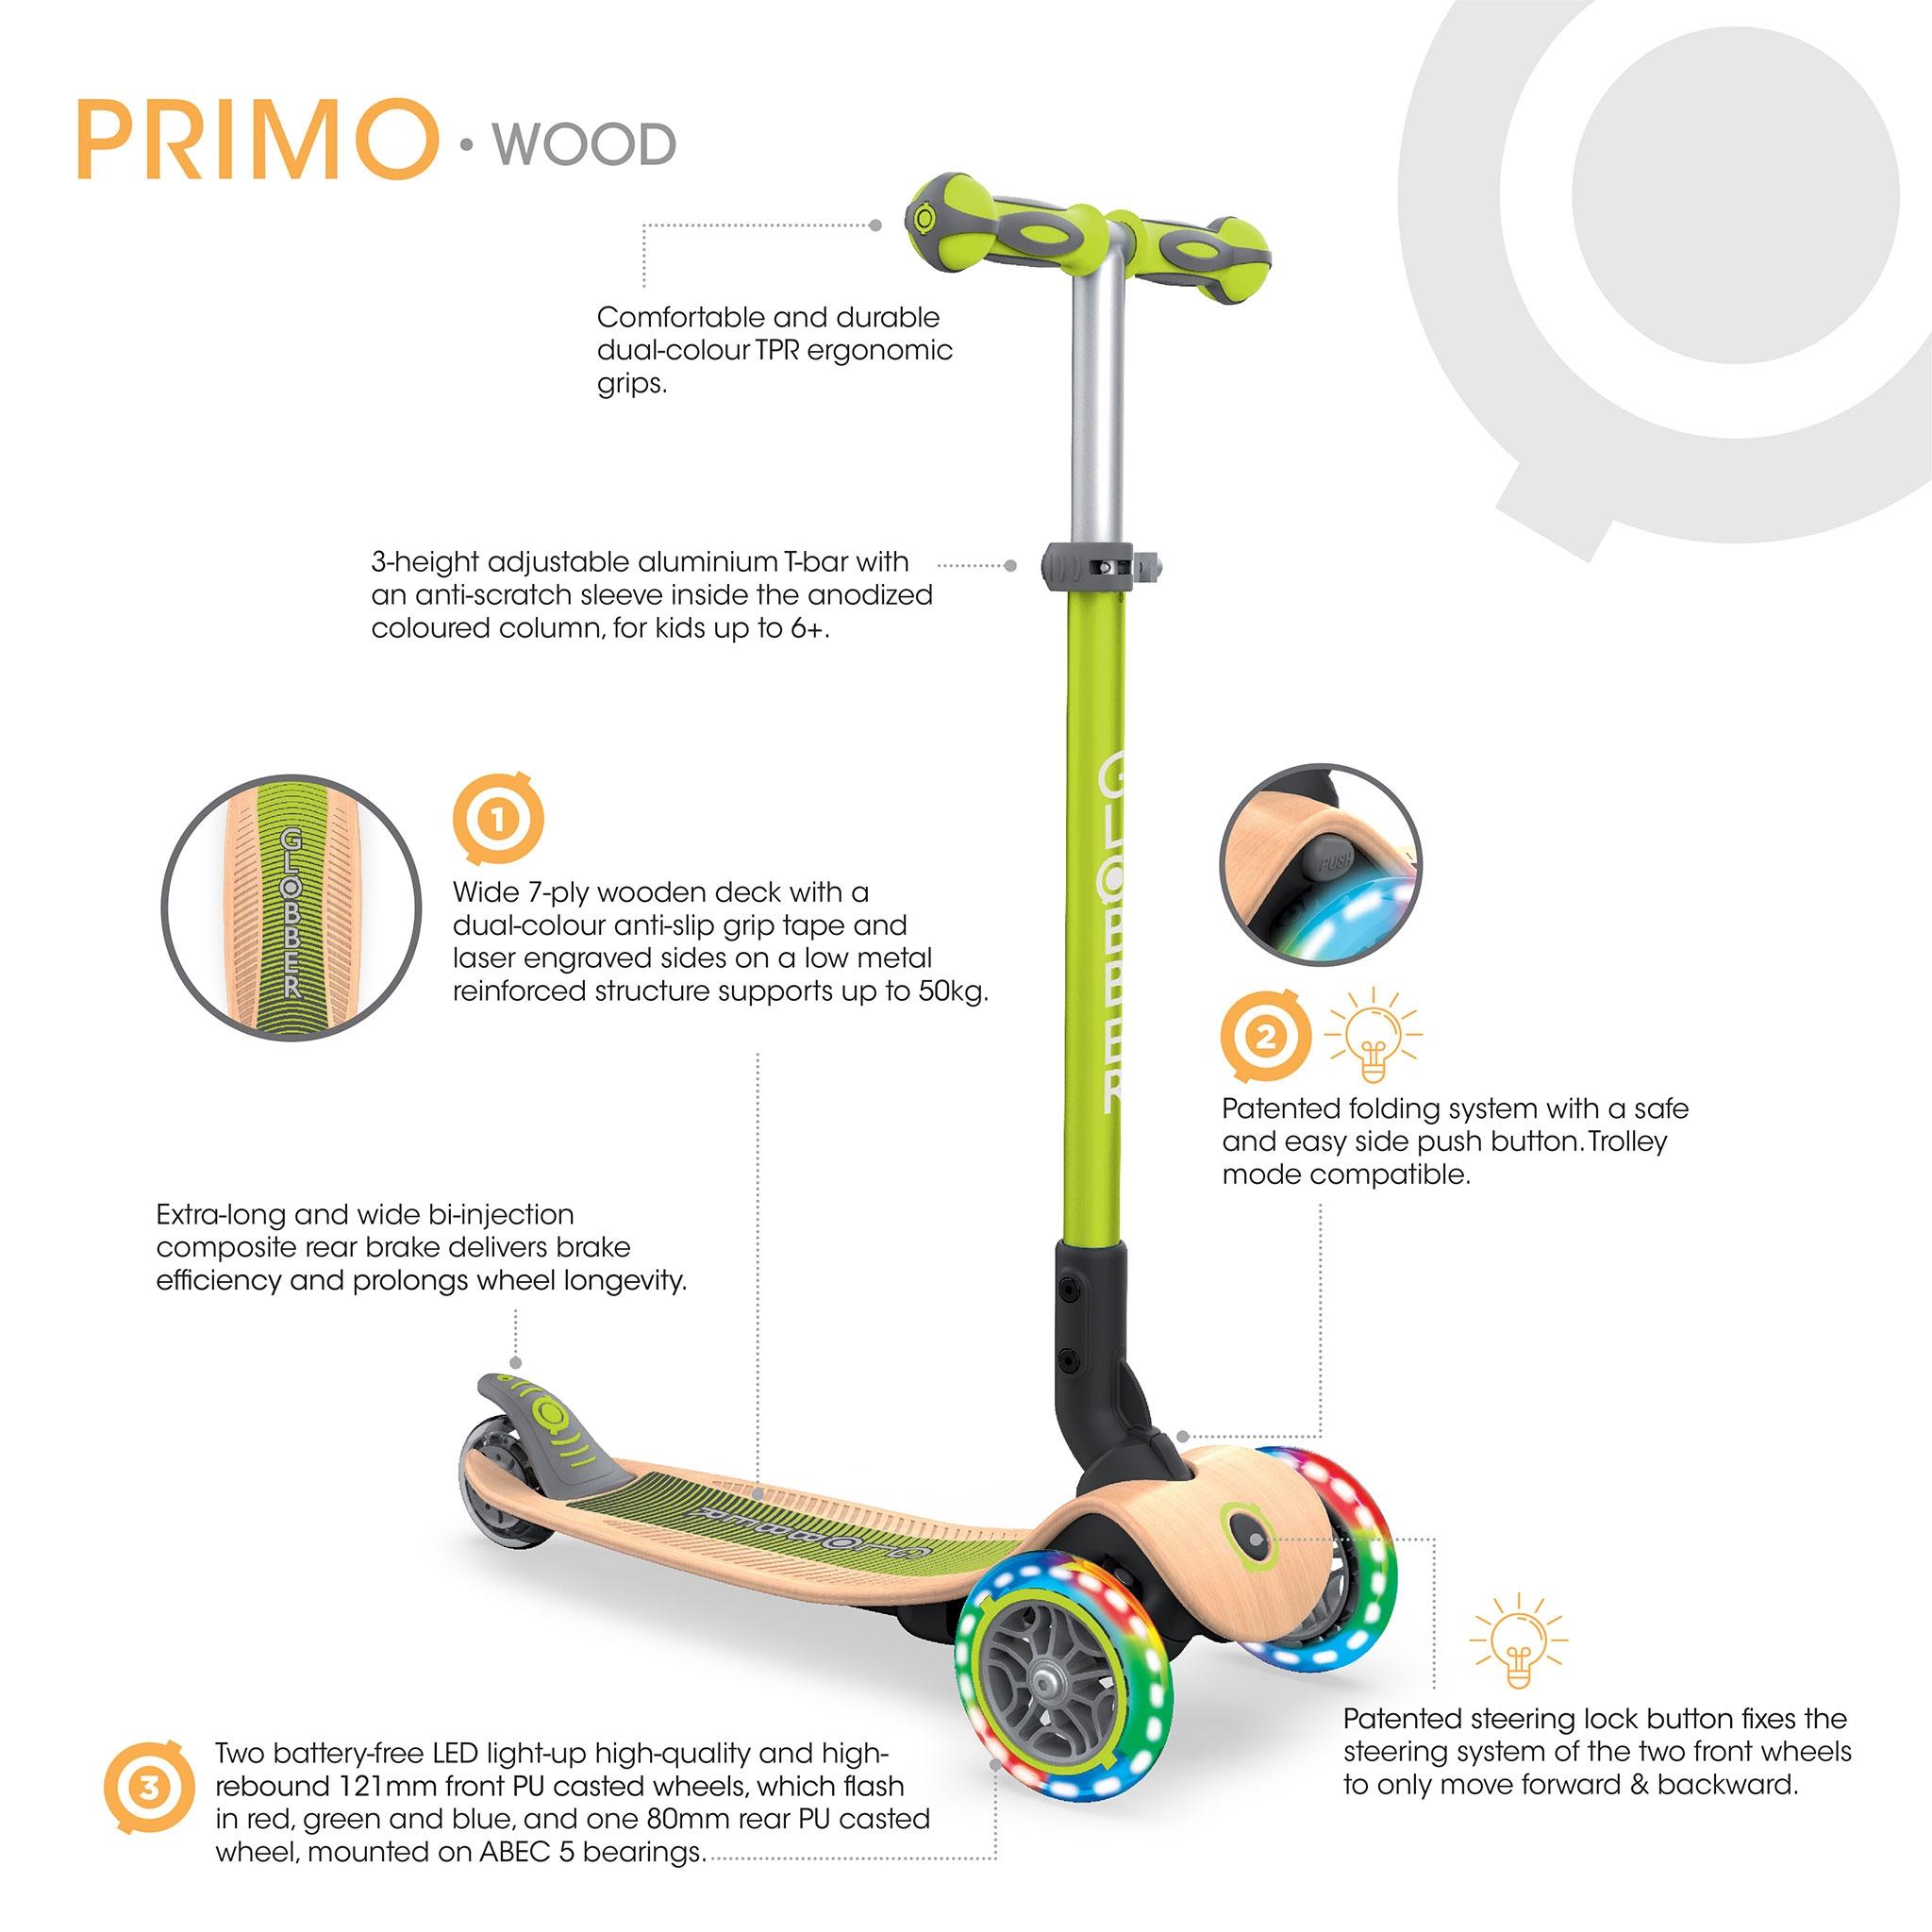 PRIMO-FOLDABLE-WOOD-LIGHTS 4